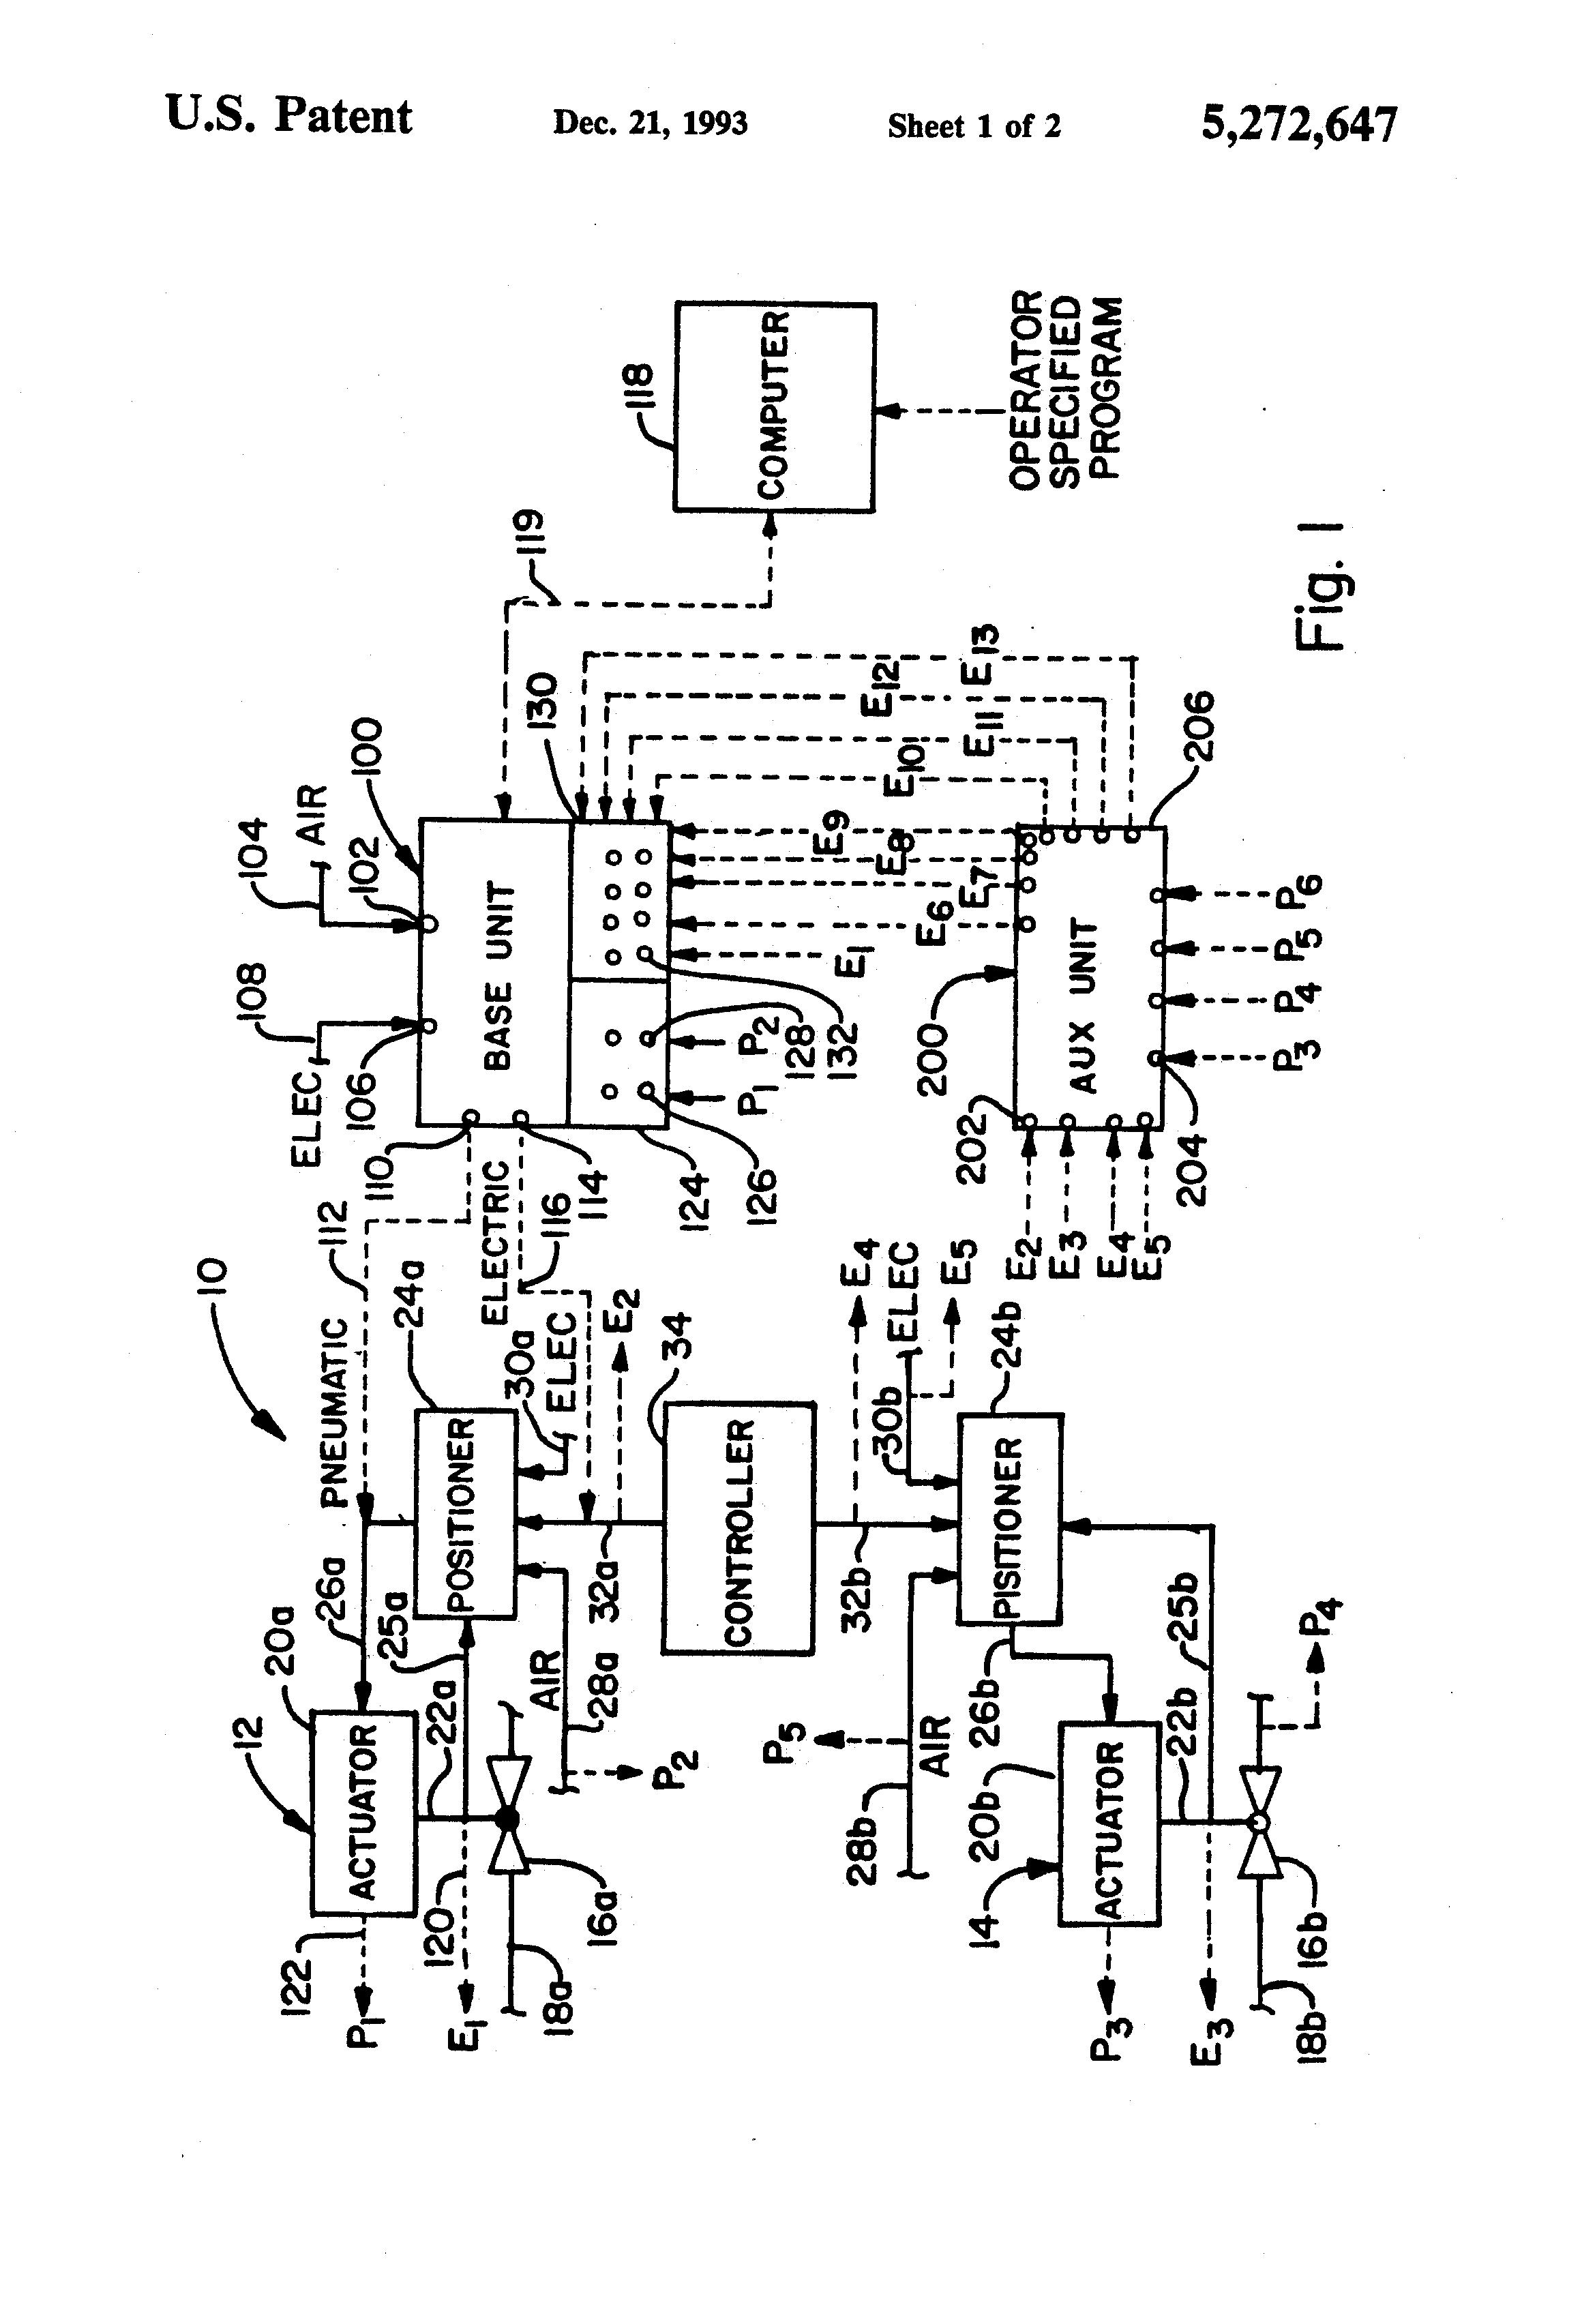 Diagram Schematic Wiring Diagram Ach 800 Full Version Hd Quality Ach 800 Pvdiagramxpauli Edizionisavine It